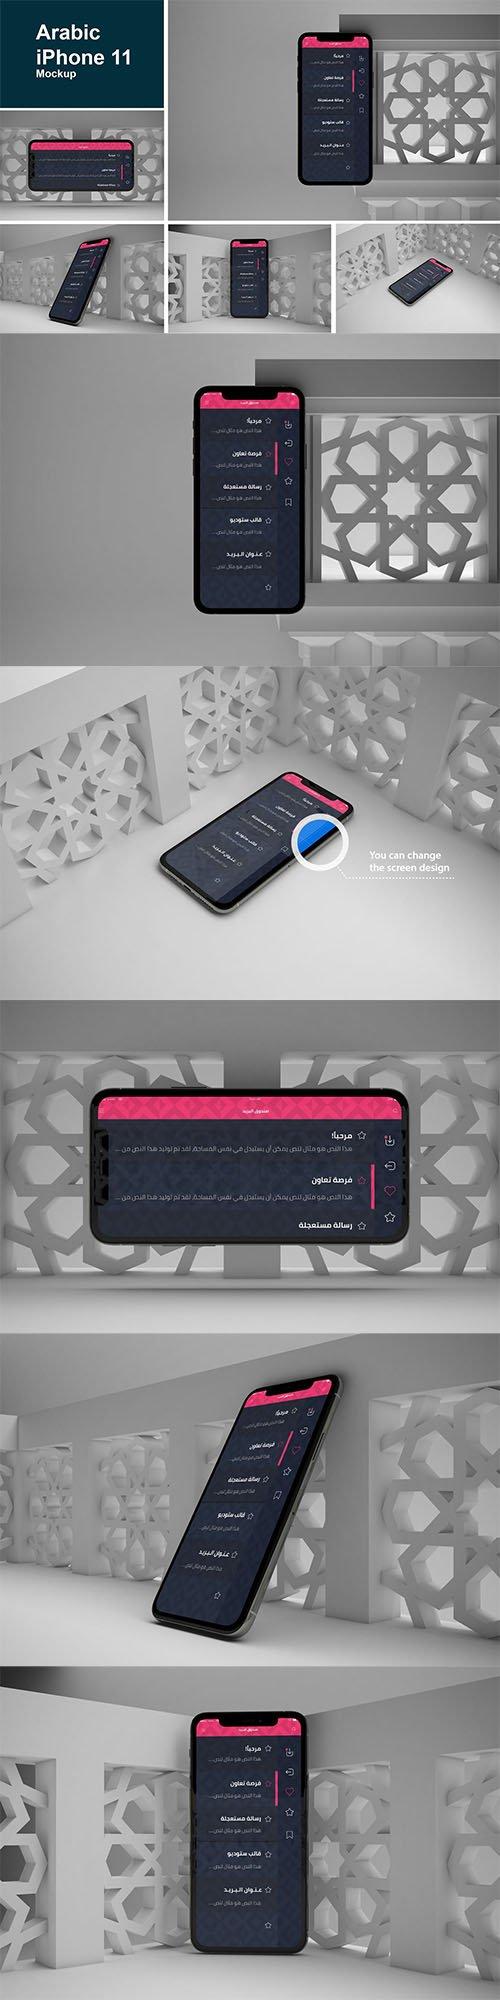 Arabic iPhone 11 Mockup